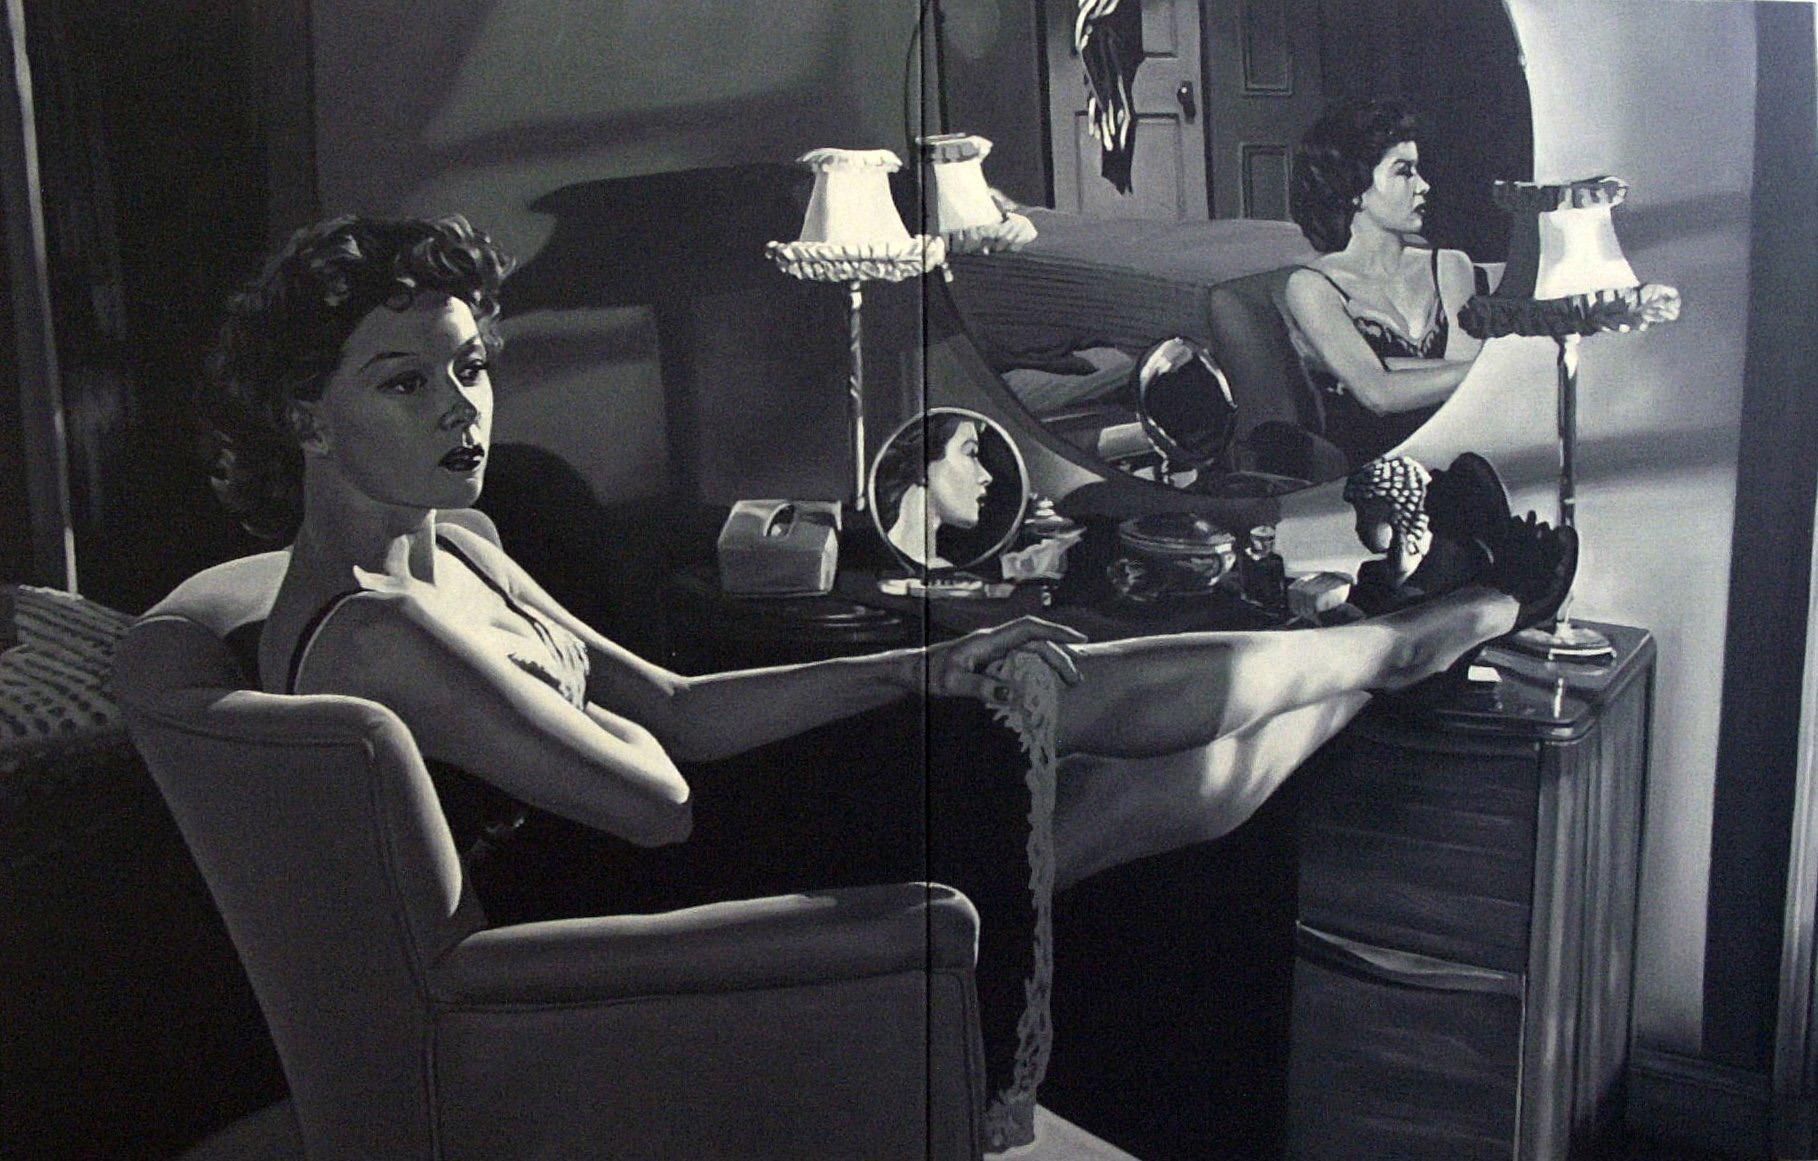 Matteo Mezzetta – Pinturas (II)